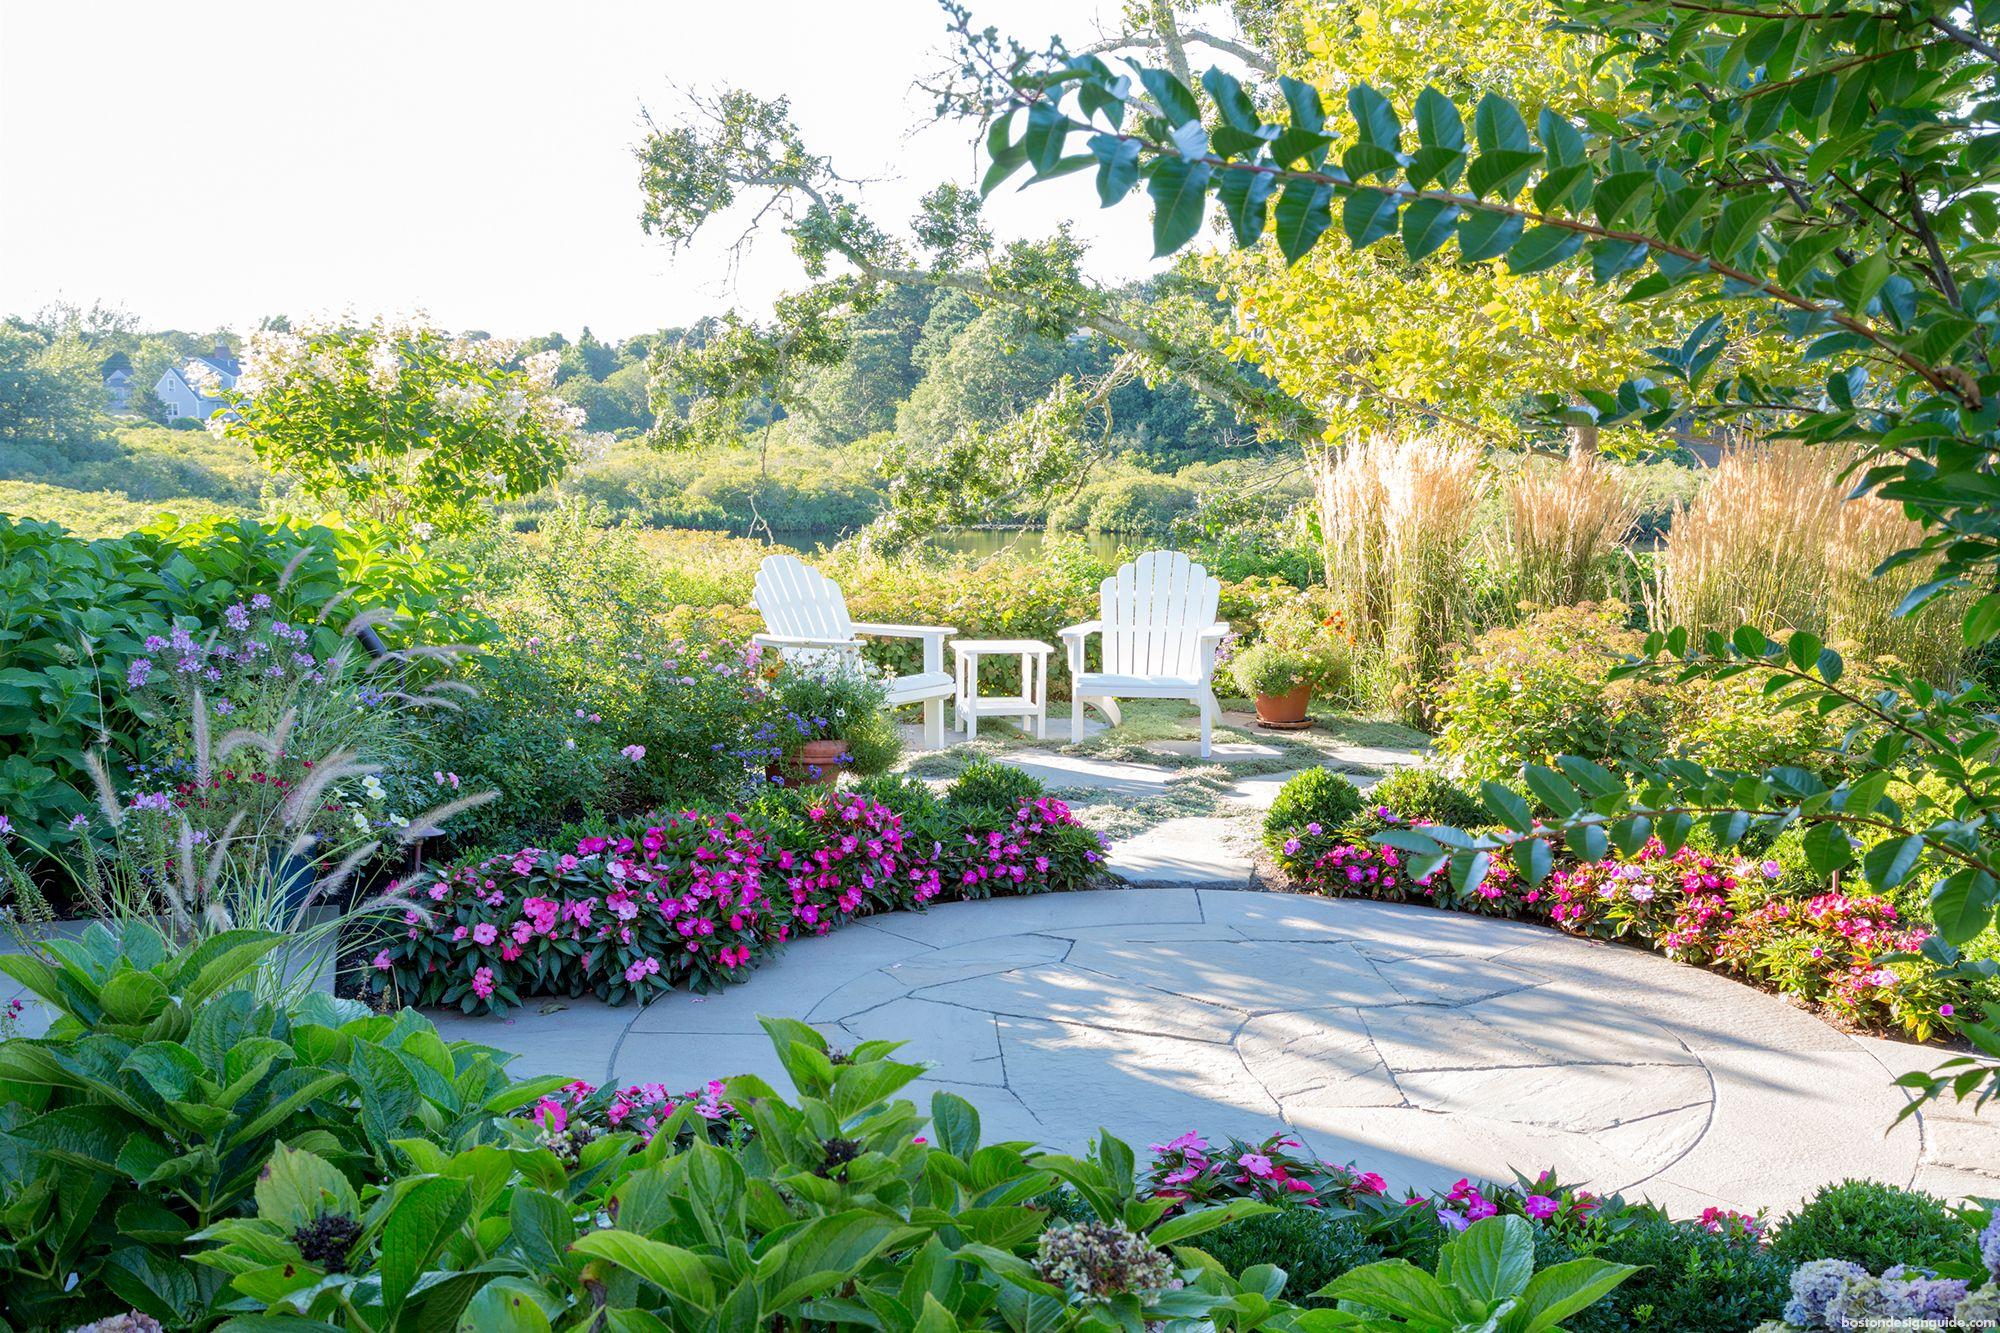 Schumacher Companies Landscaping In Boston And West Bridgewater Ma Landscape Design Landscape Construction Landscape